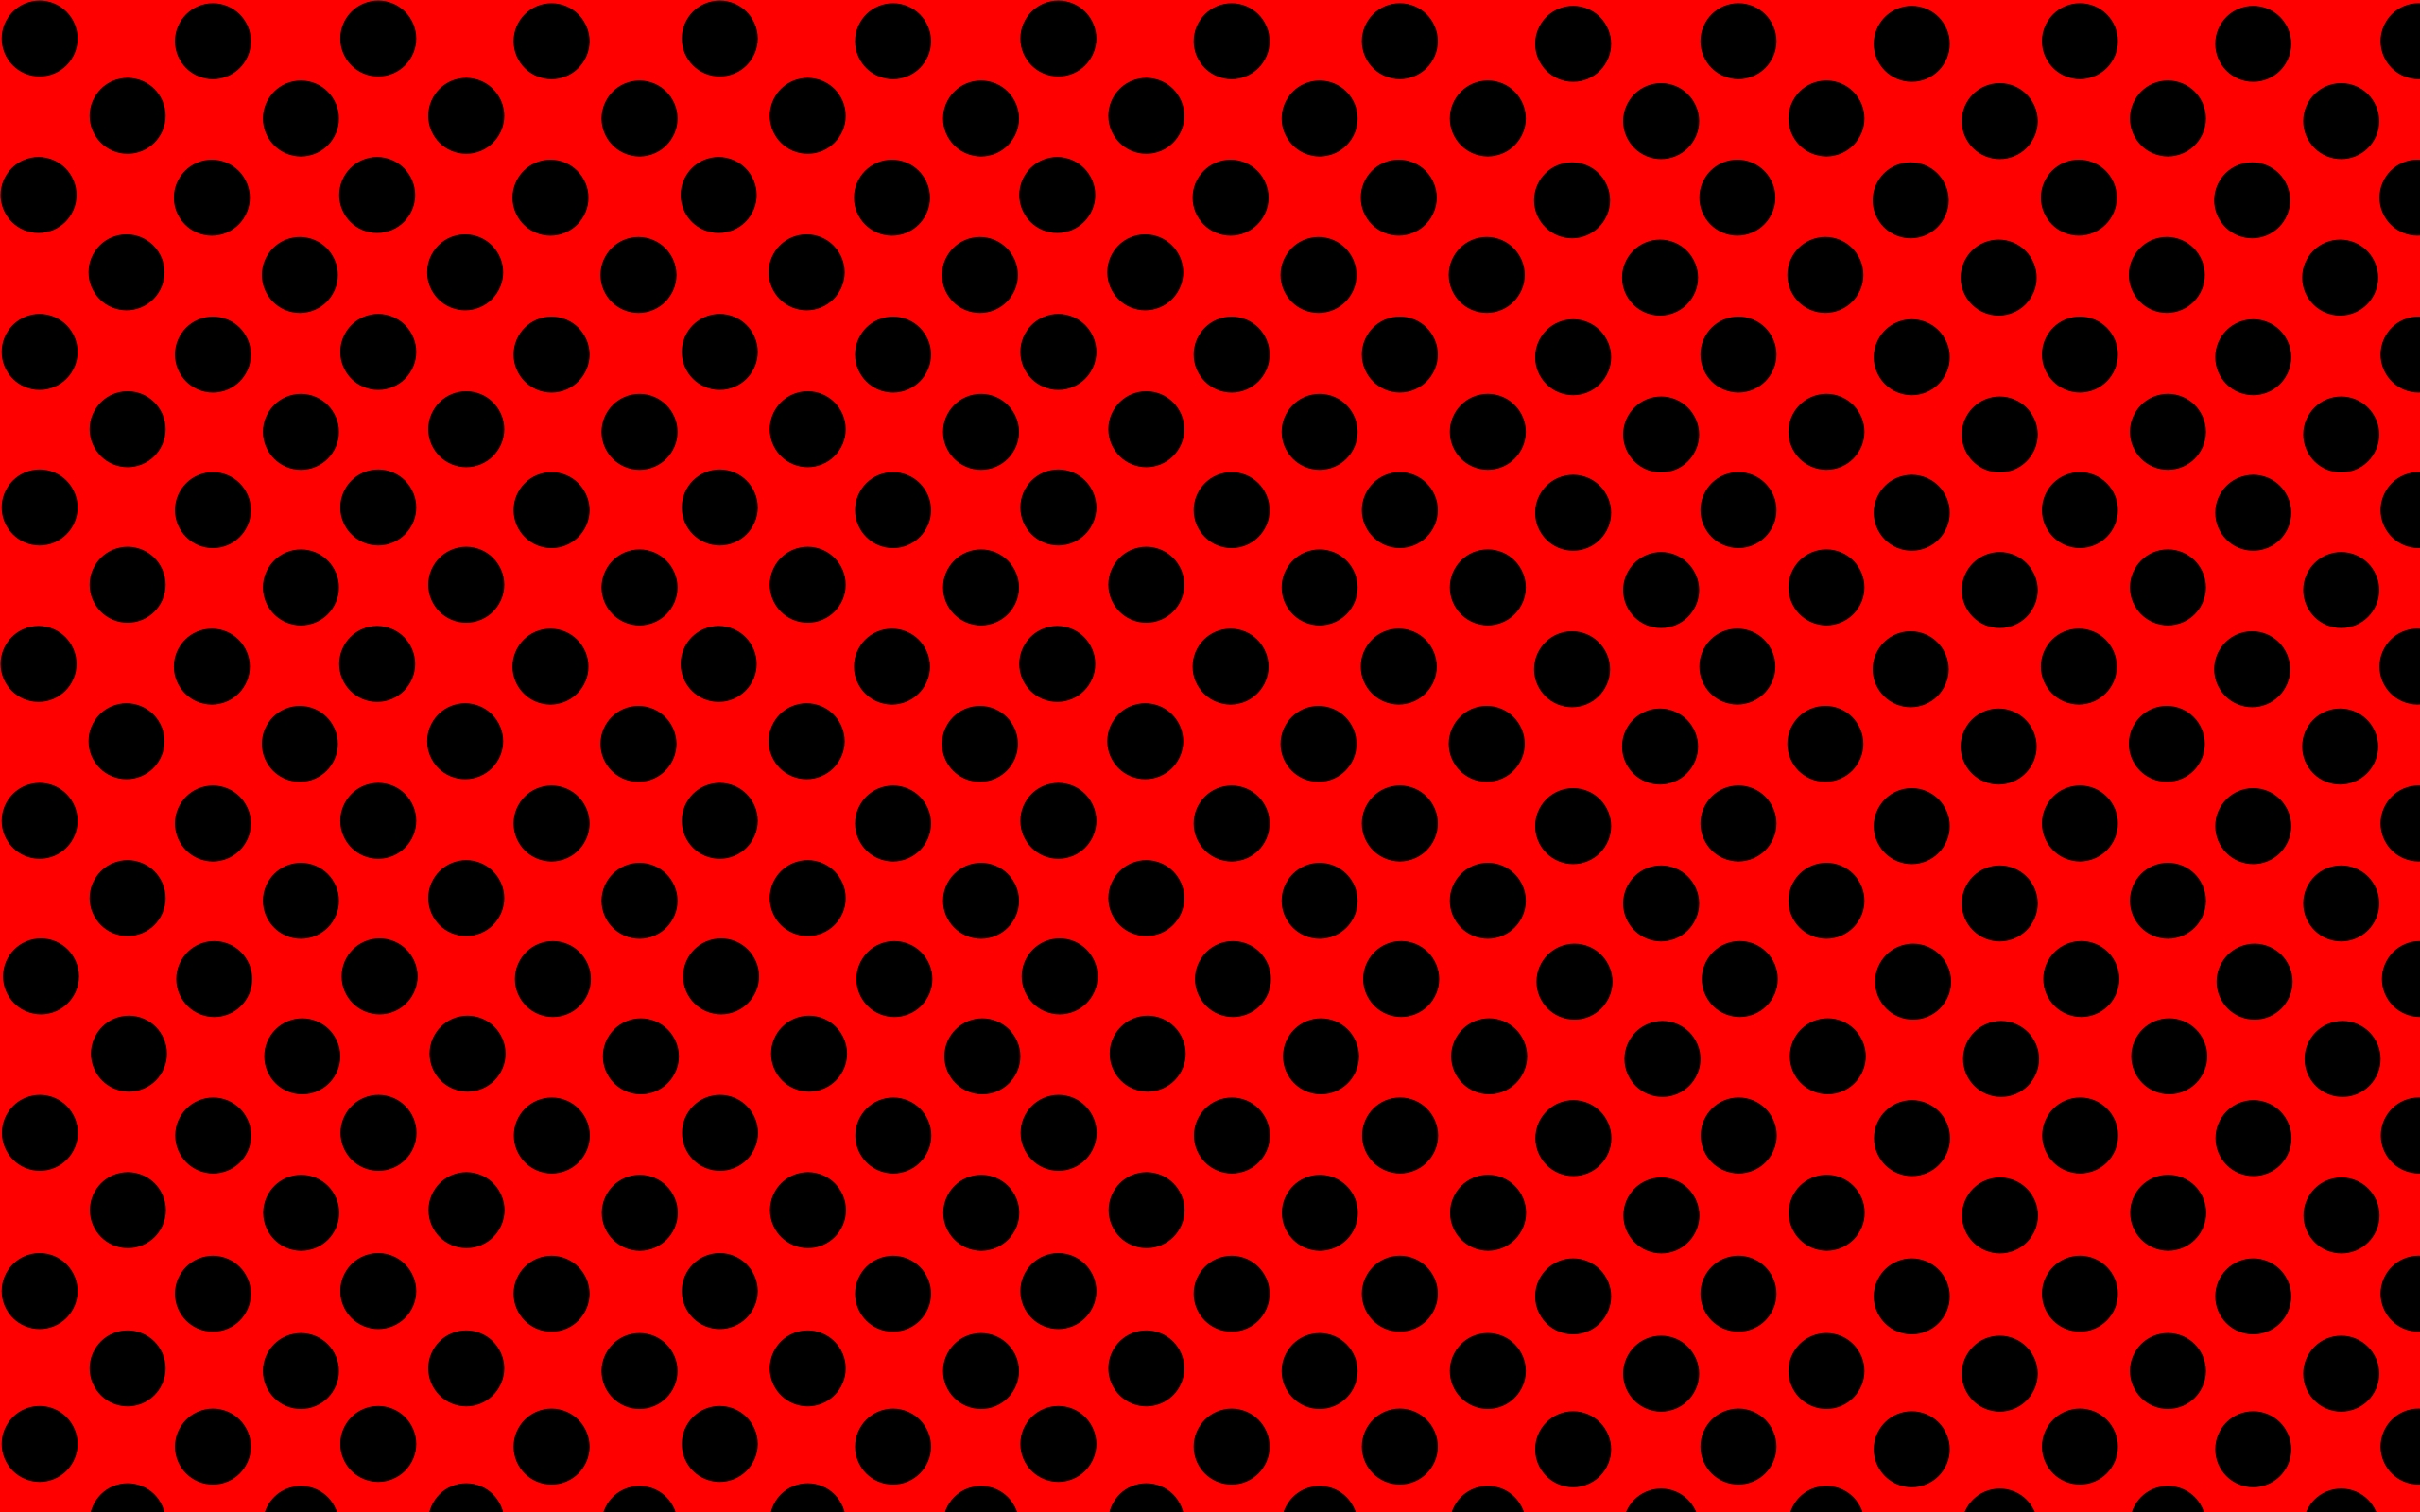 Red And Black Graffiti Wallpaper Free Download Dot Backgrounds Pixelstalk Net